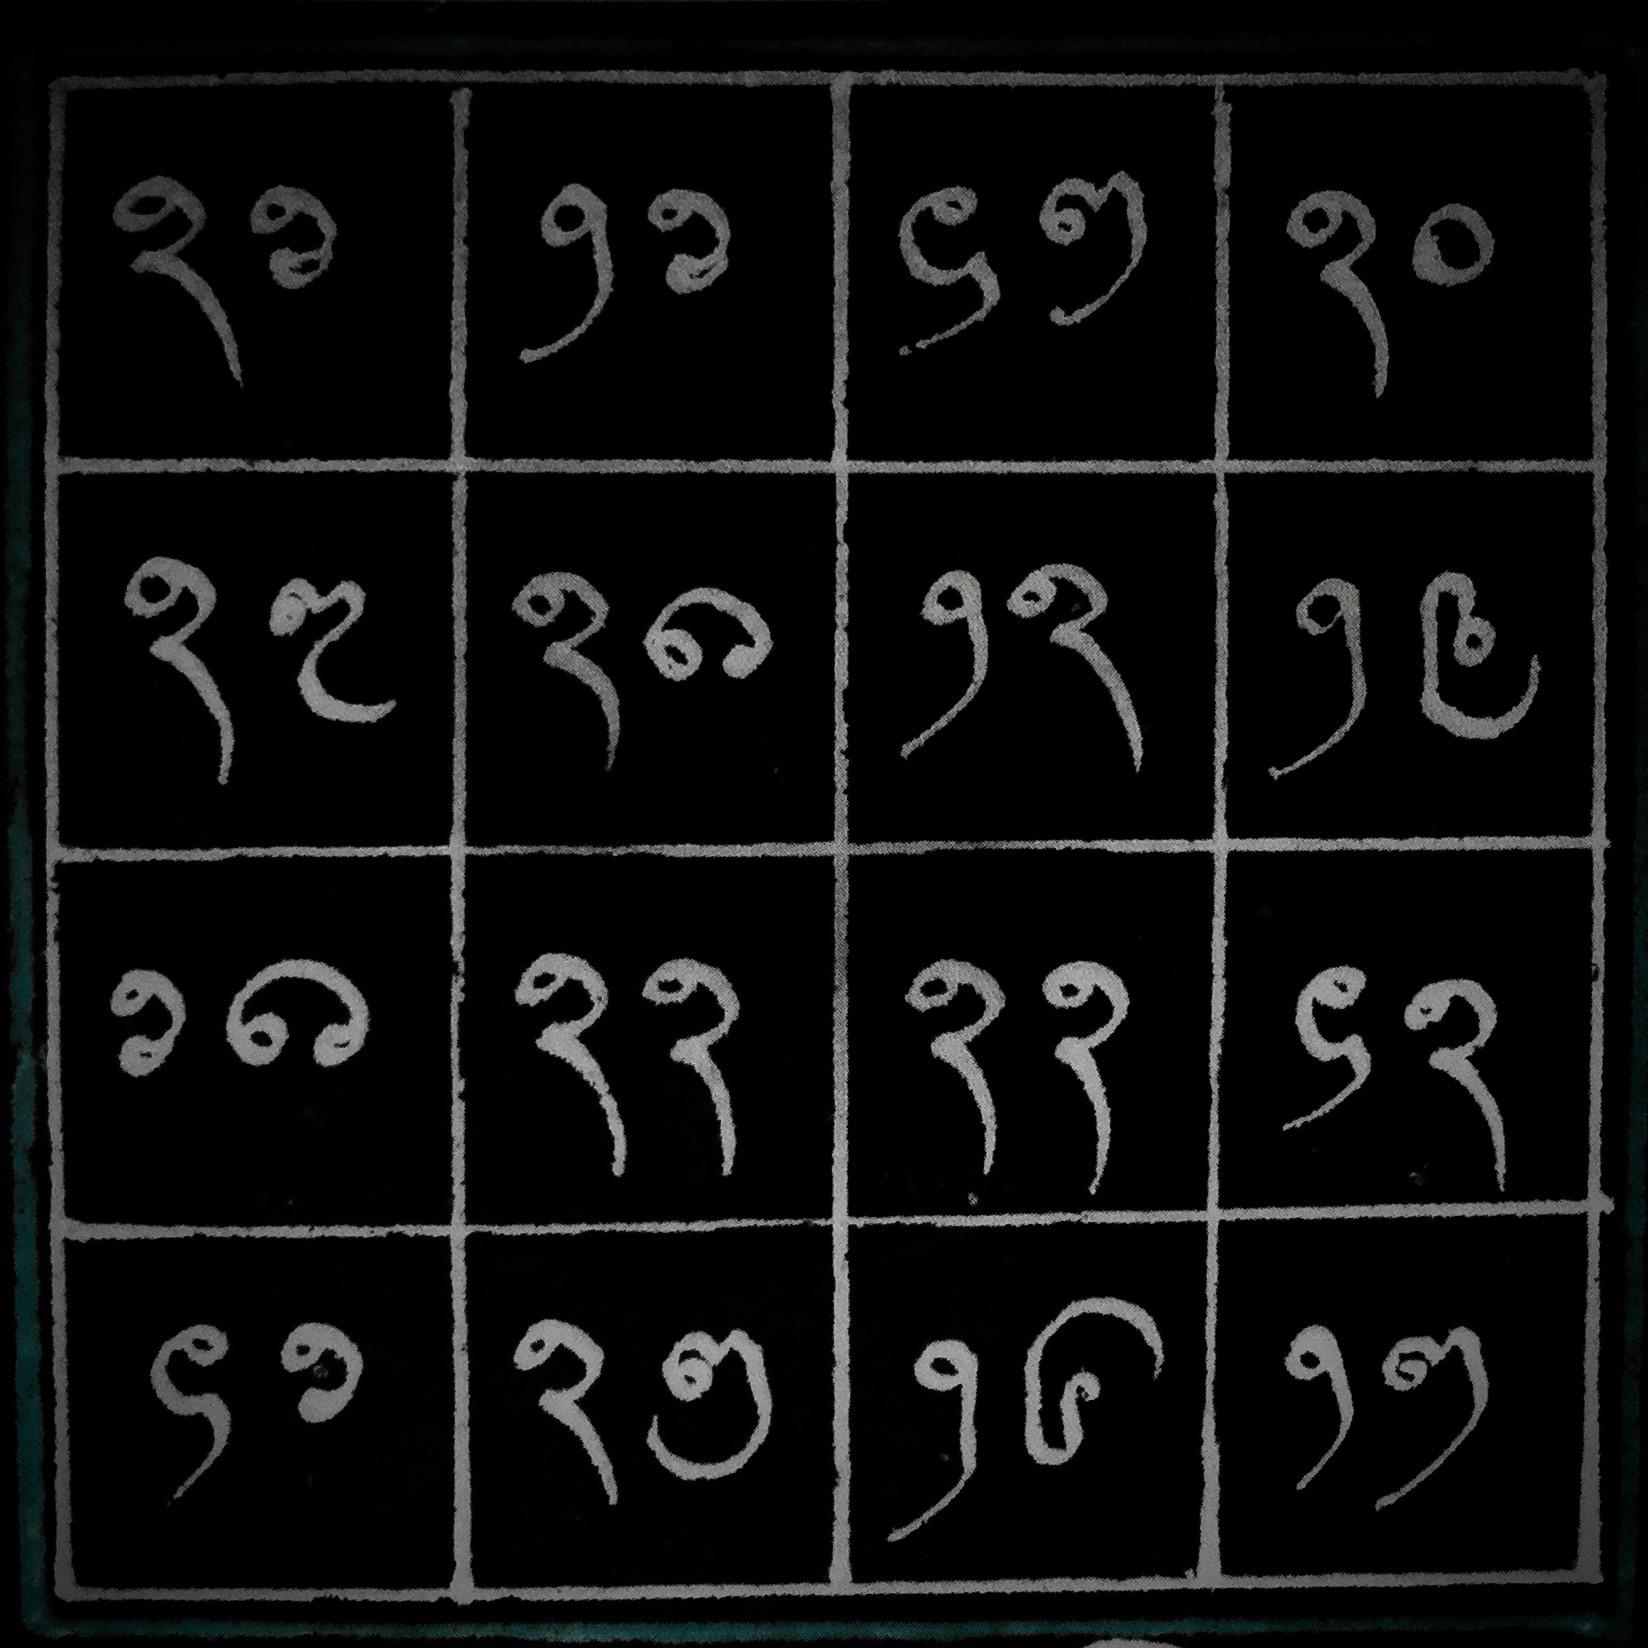 Yant Tam Roke Haay Lanna - Ancient Lanna Yantra for removing illnesses